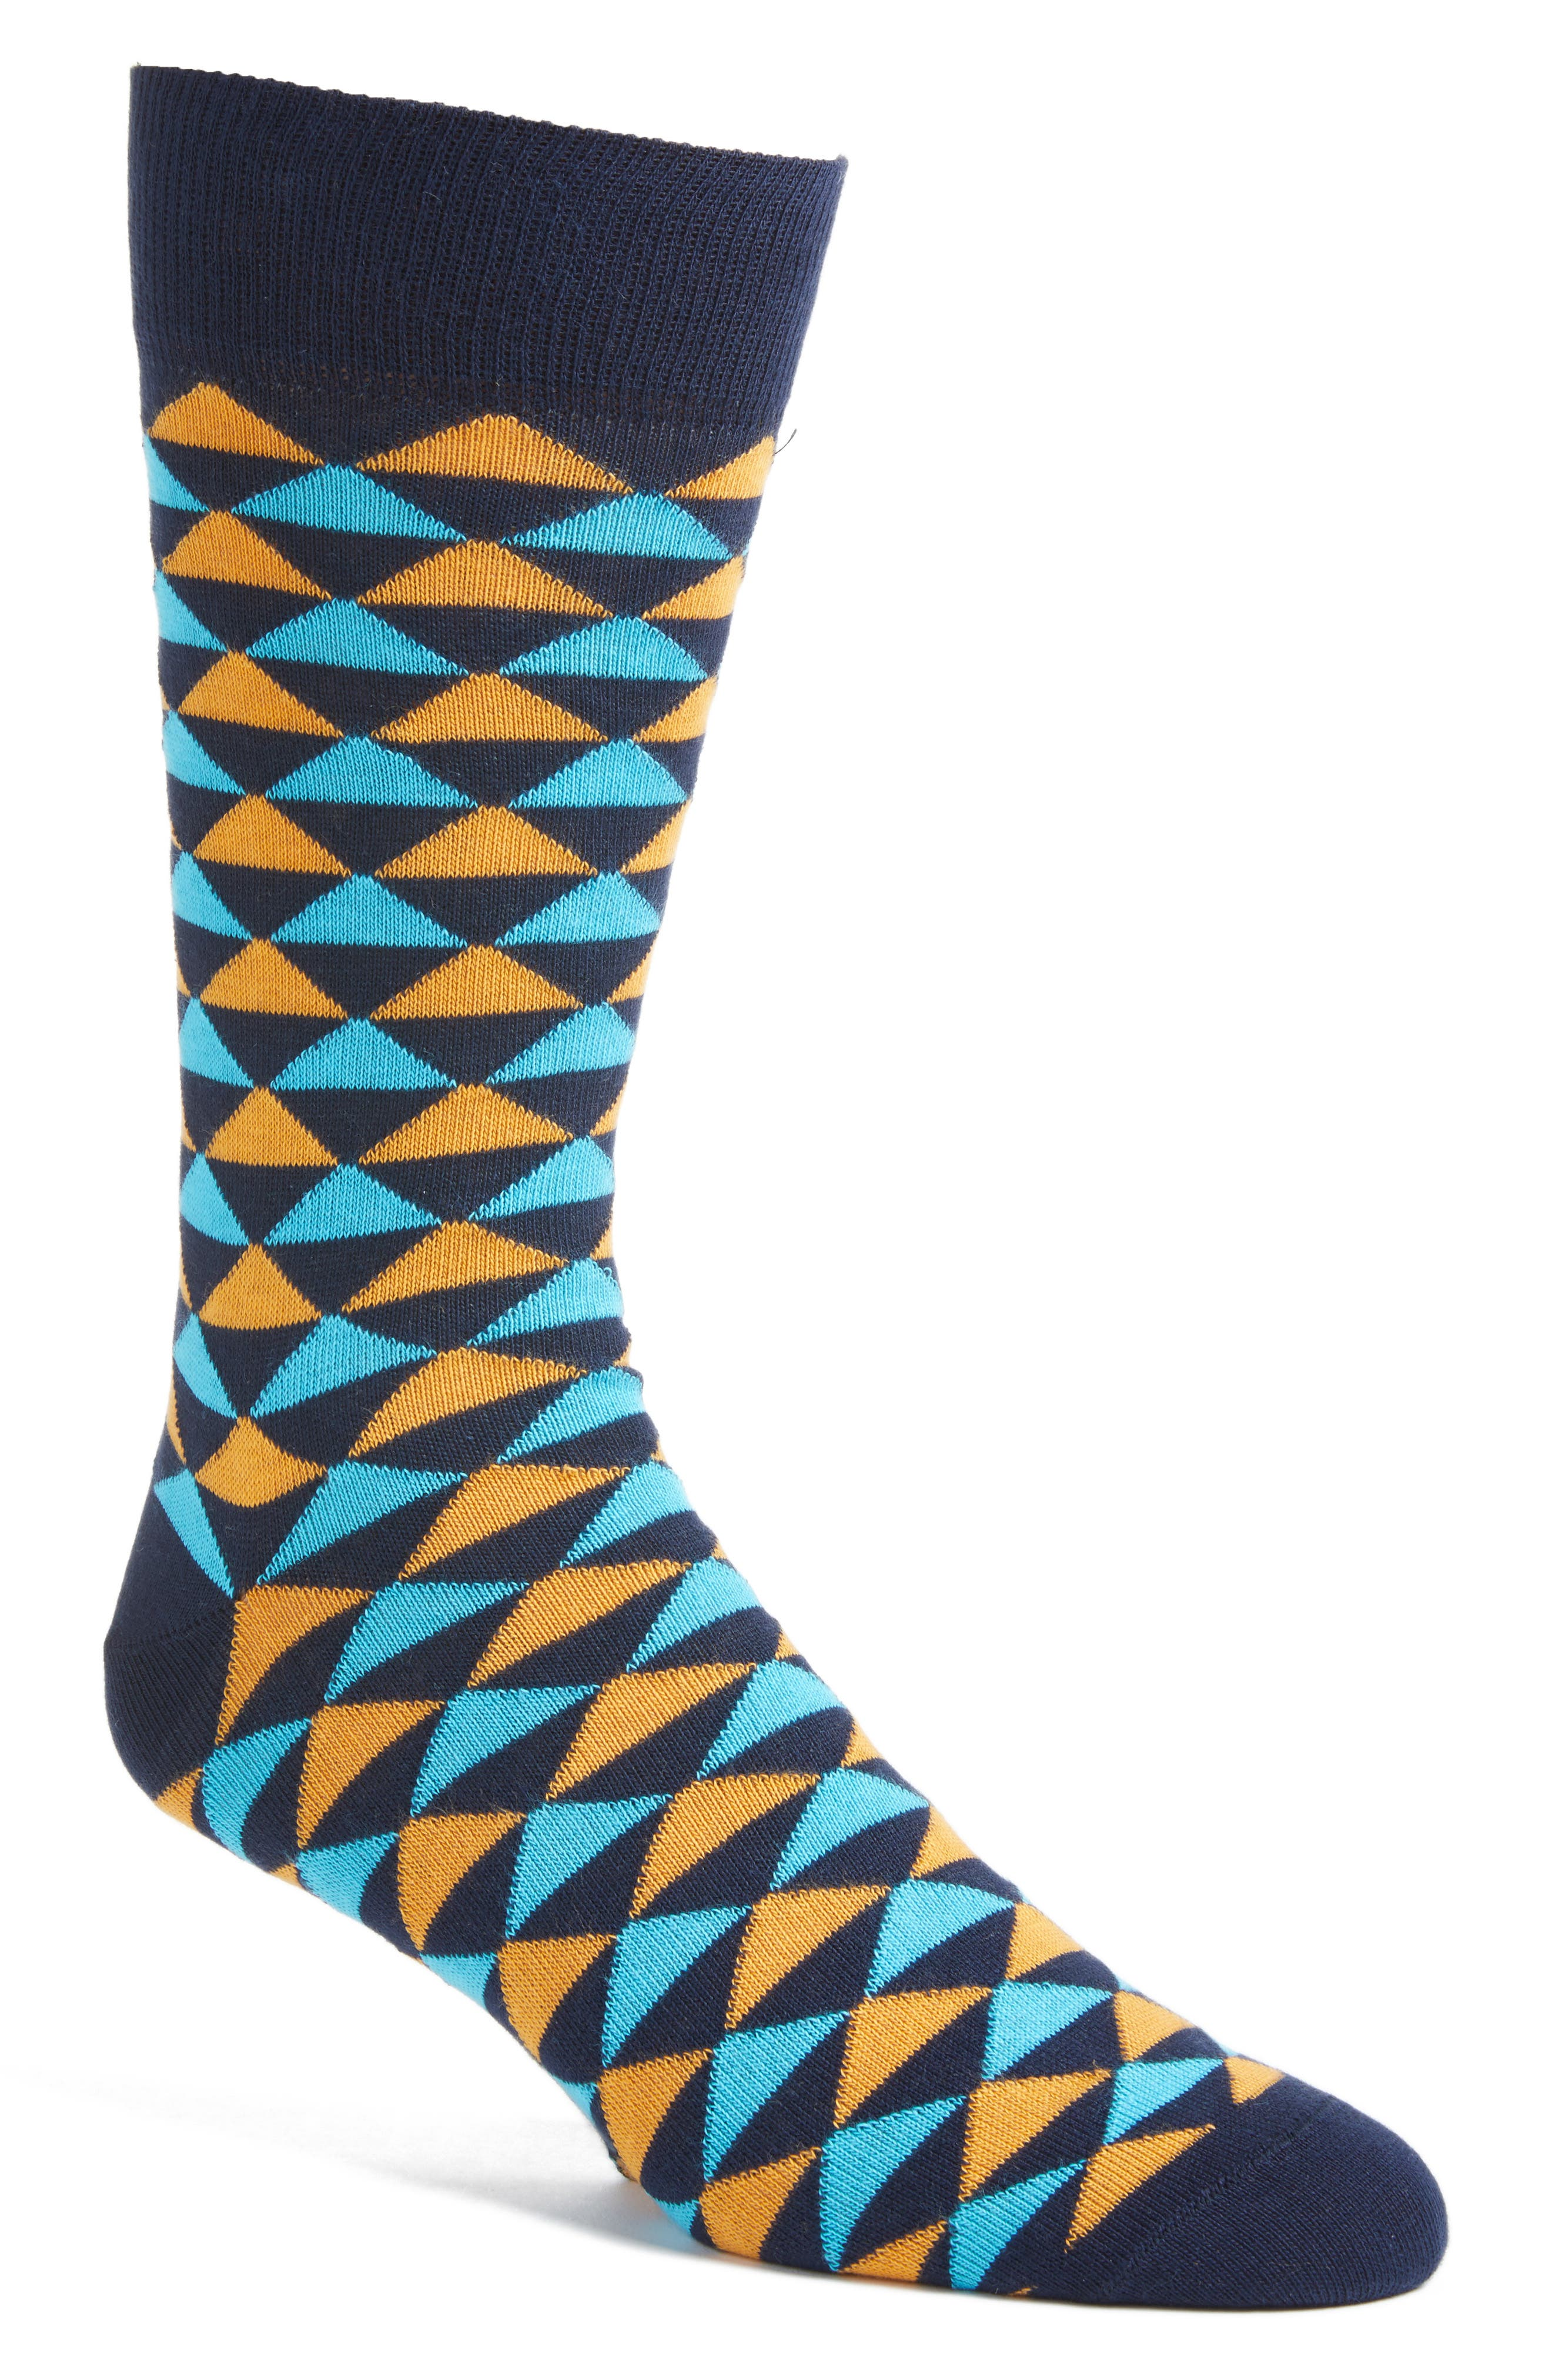 Lorenzo Uomo Triangles Crew Socks